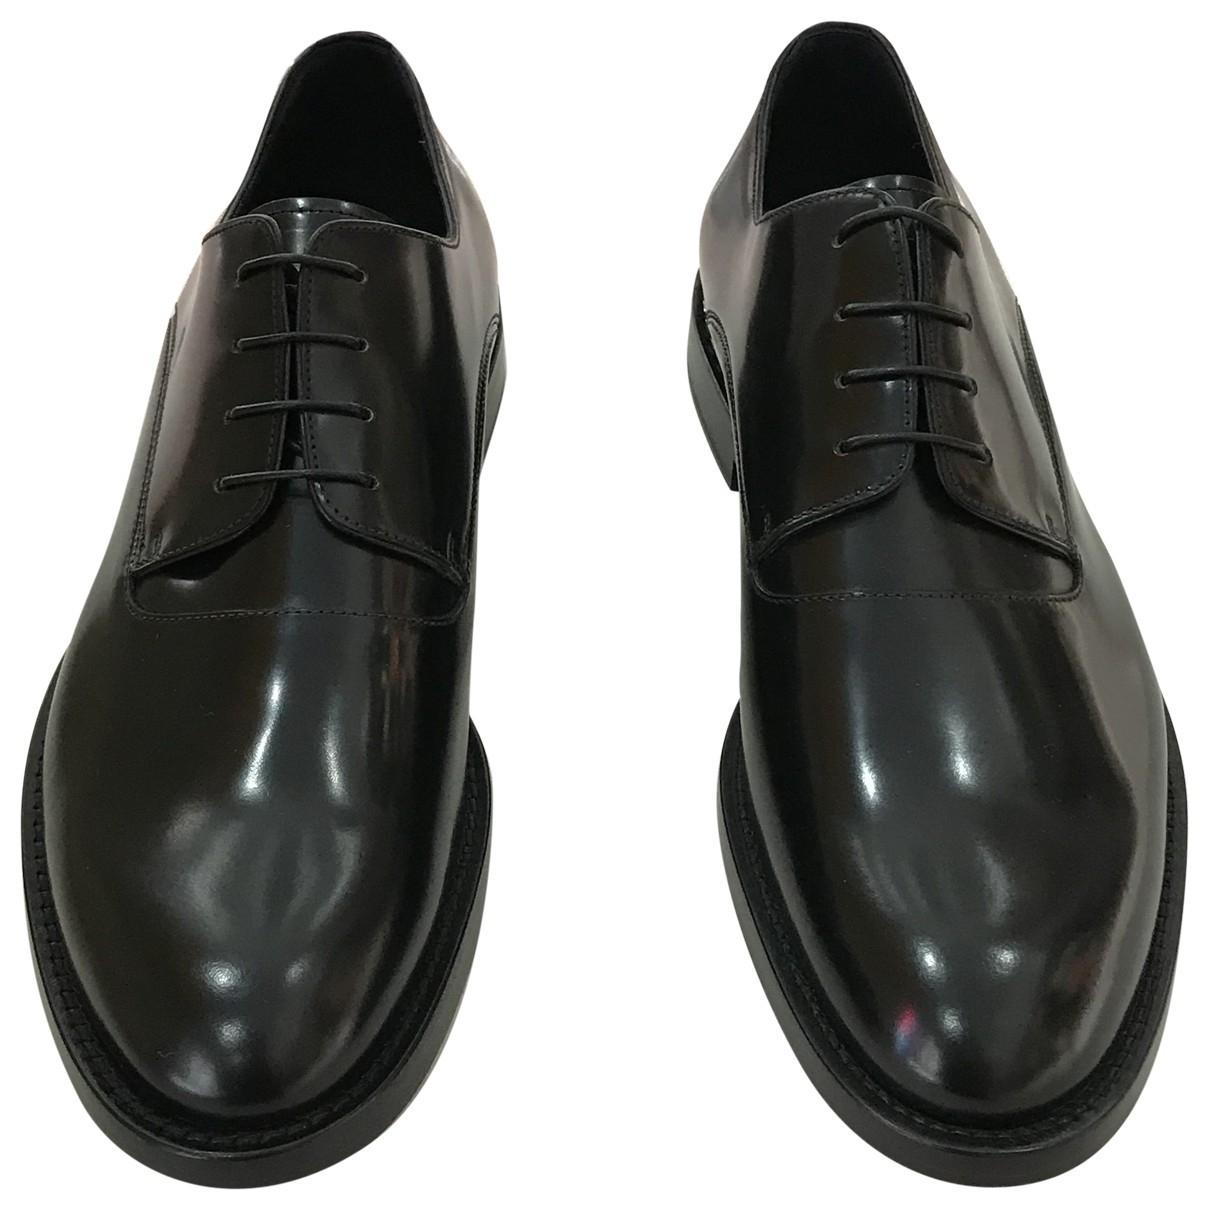 Fendi \N Black Leather Lace ups for Men 43 EU